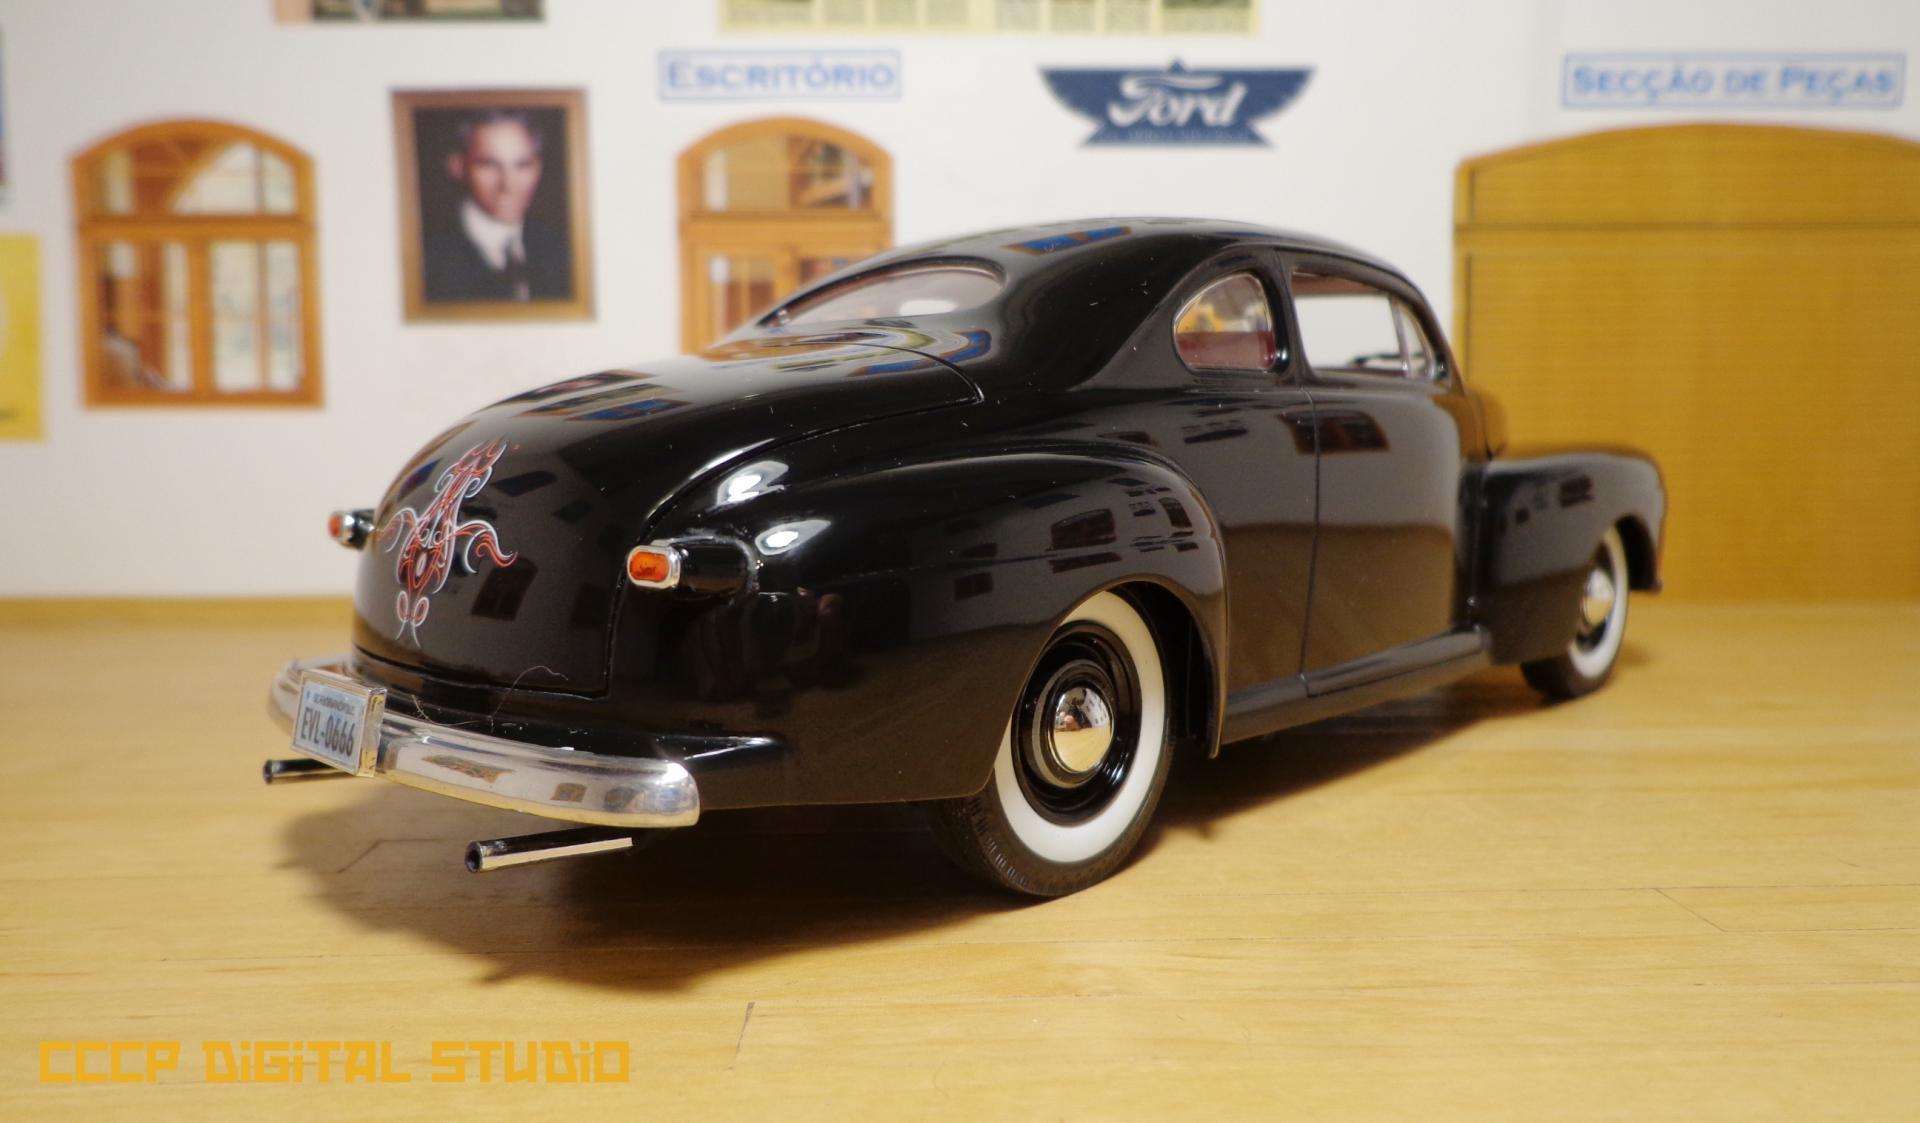 1948 Ford Custom Coupe 004 copy.jpg